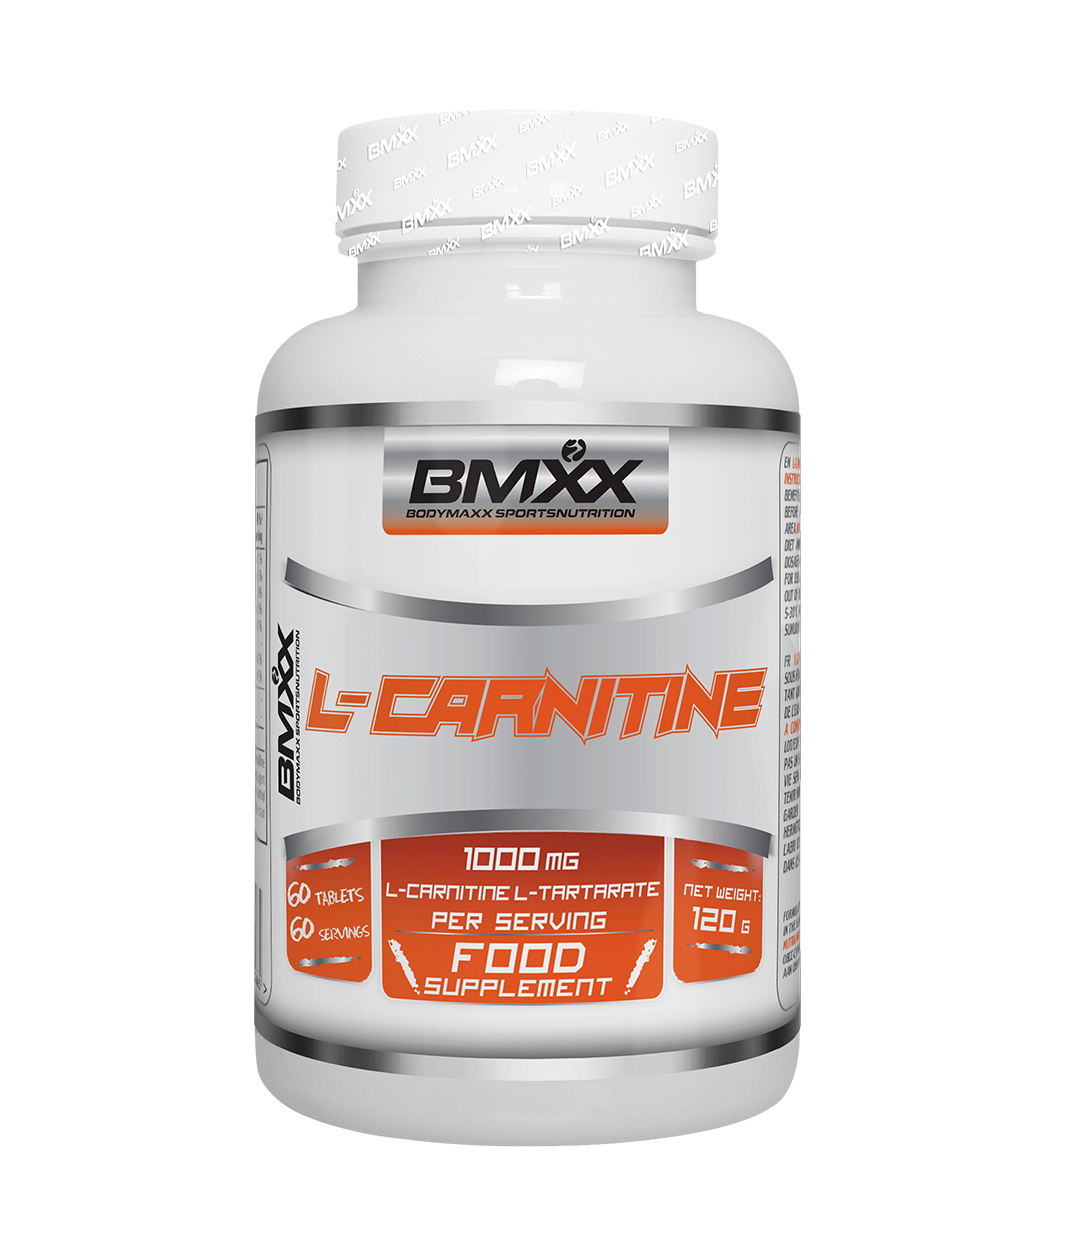 L-CARNITINE BMXX